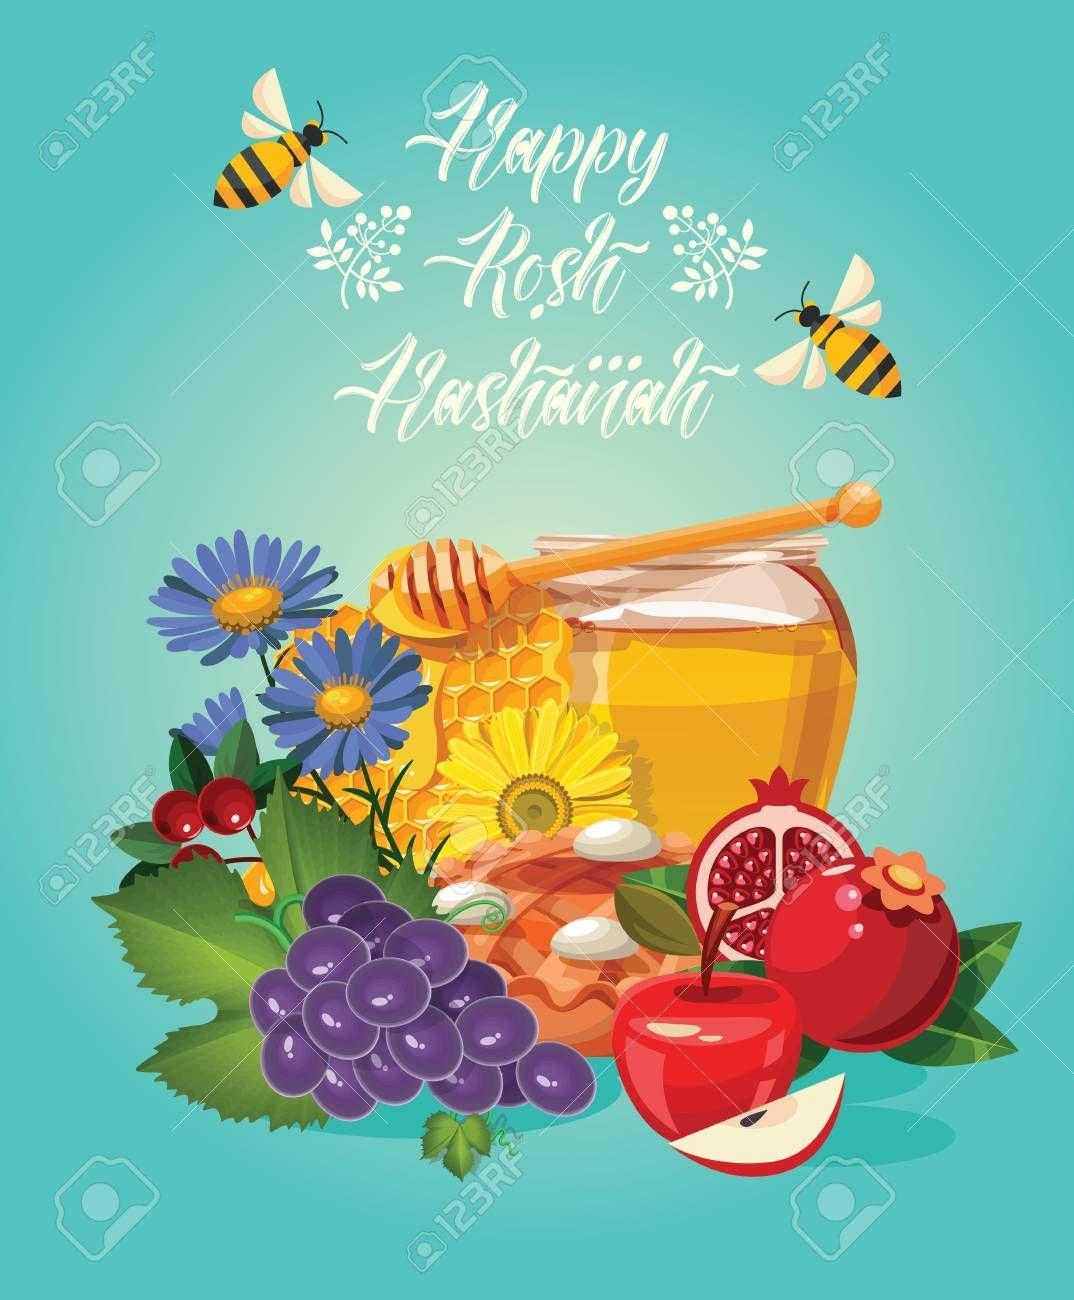 Happy Rosh Hashanah vector greeting card. New year poster in modern style. Shana tova , #Ad, #vector, #greeting, #card, #Happy, #Rosh #happyroshhashanah Happy Rosh Hashanah vector greeting card. New year poster in modern style. Shana tova , #Ad, #vector, #greeting, #card, #Happy, #Rosh #happyroshhashanah